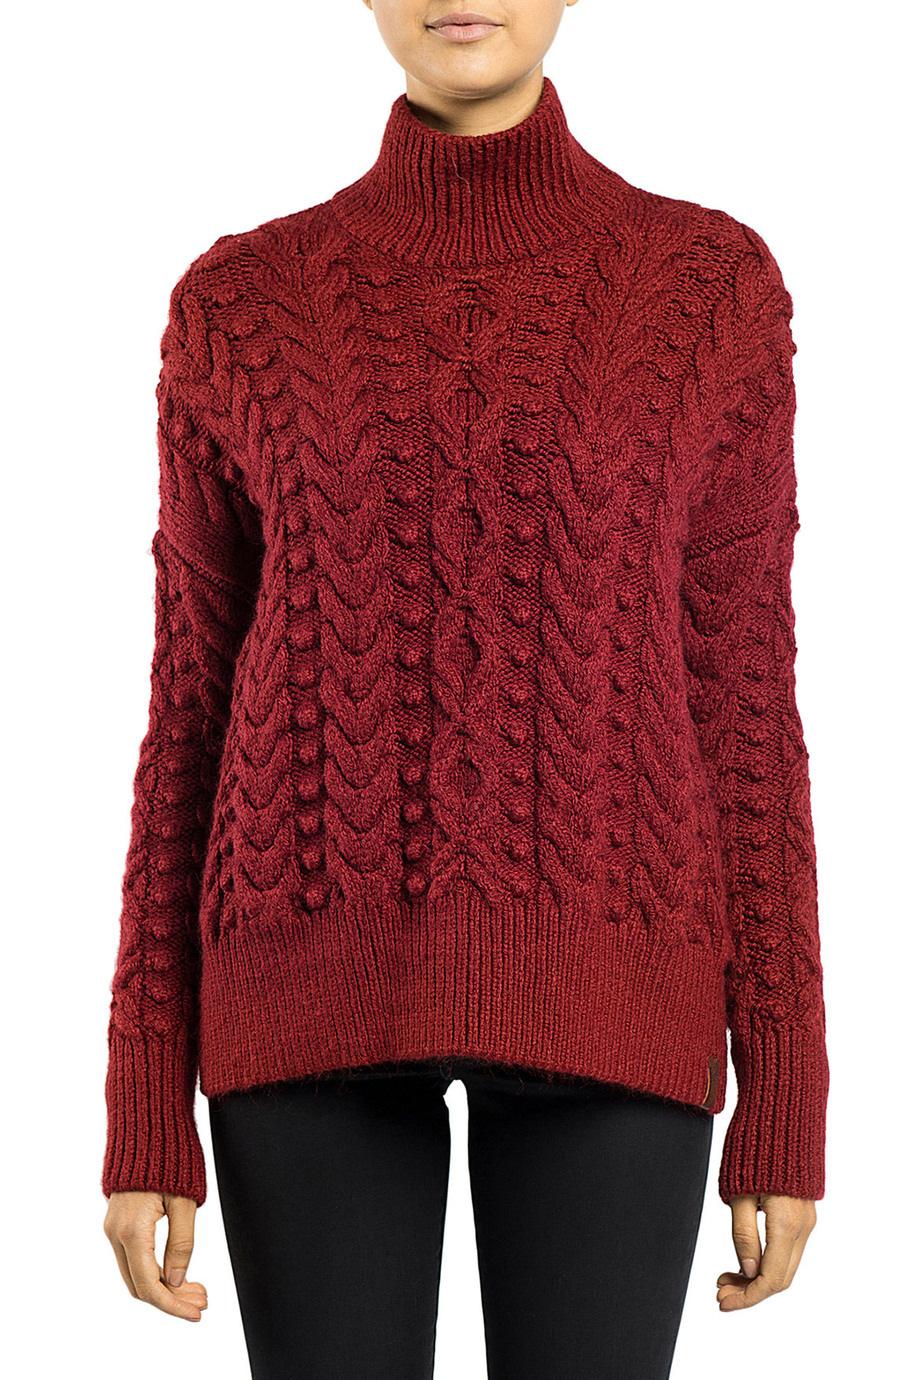 NEW Superdry Kiki Cable Knit Sweater Burgundy | eBay